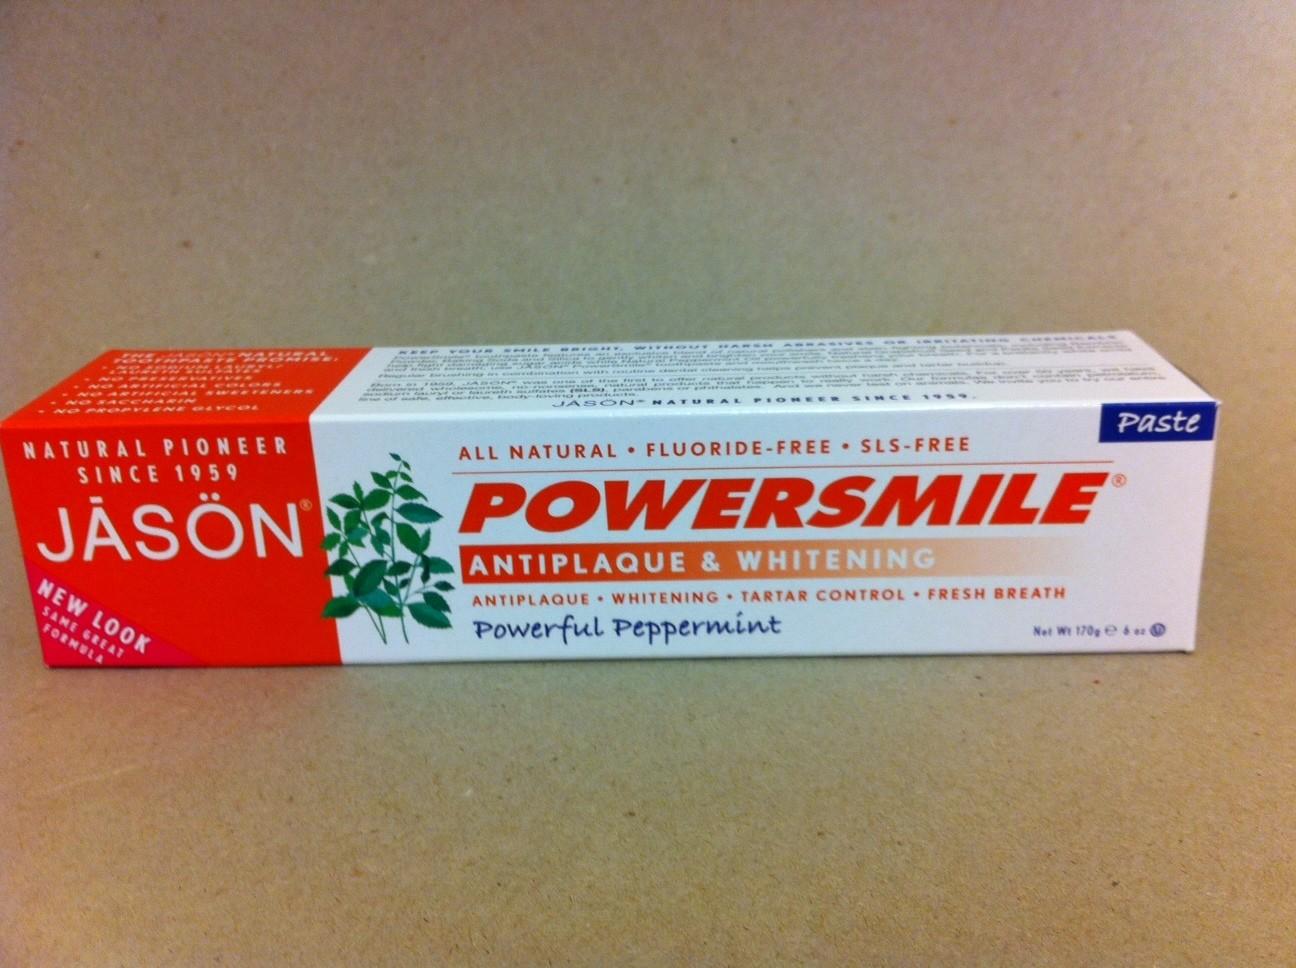 Jason Powerful Peppermint Toothpaste